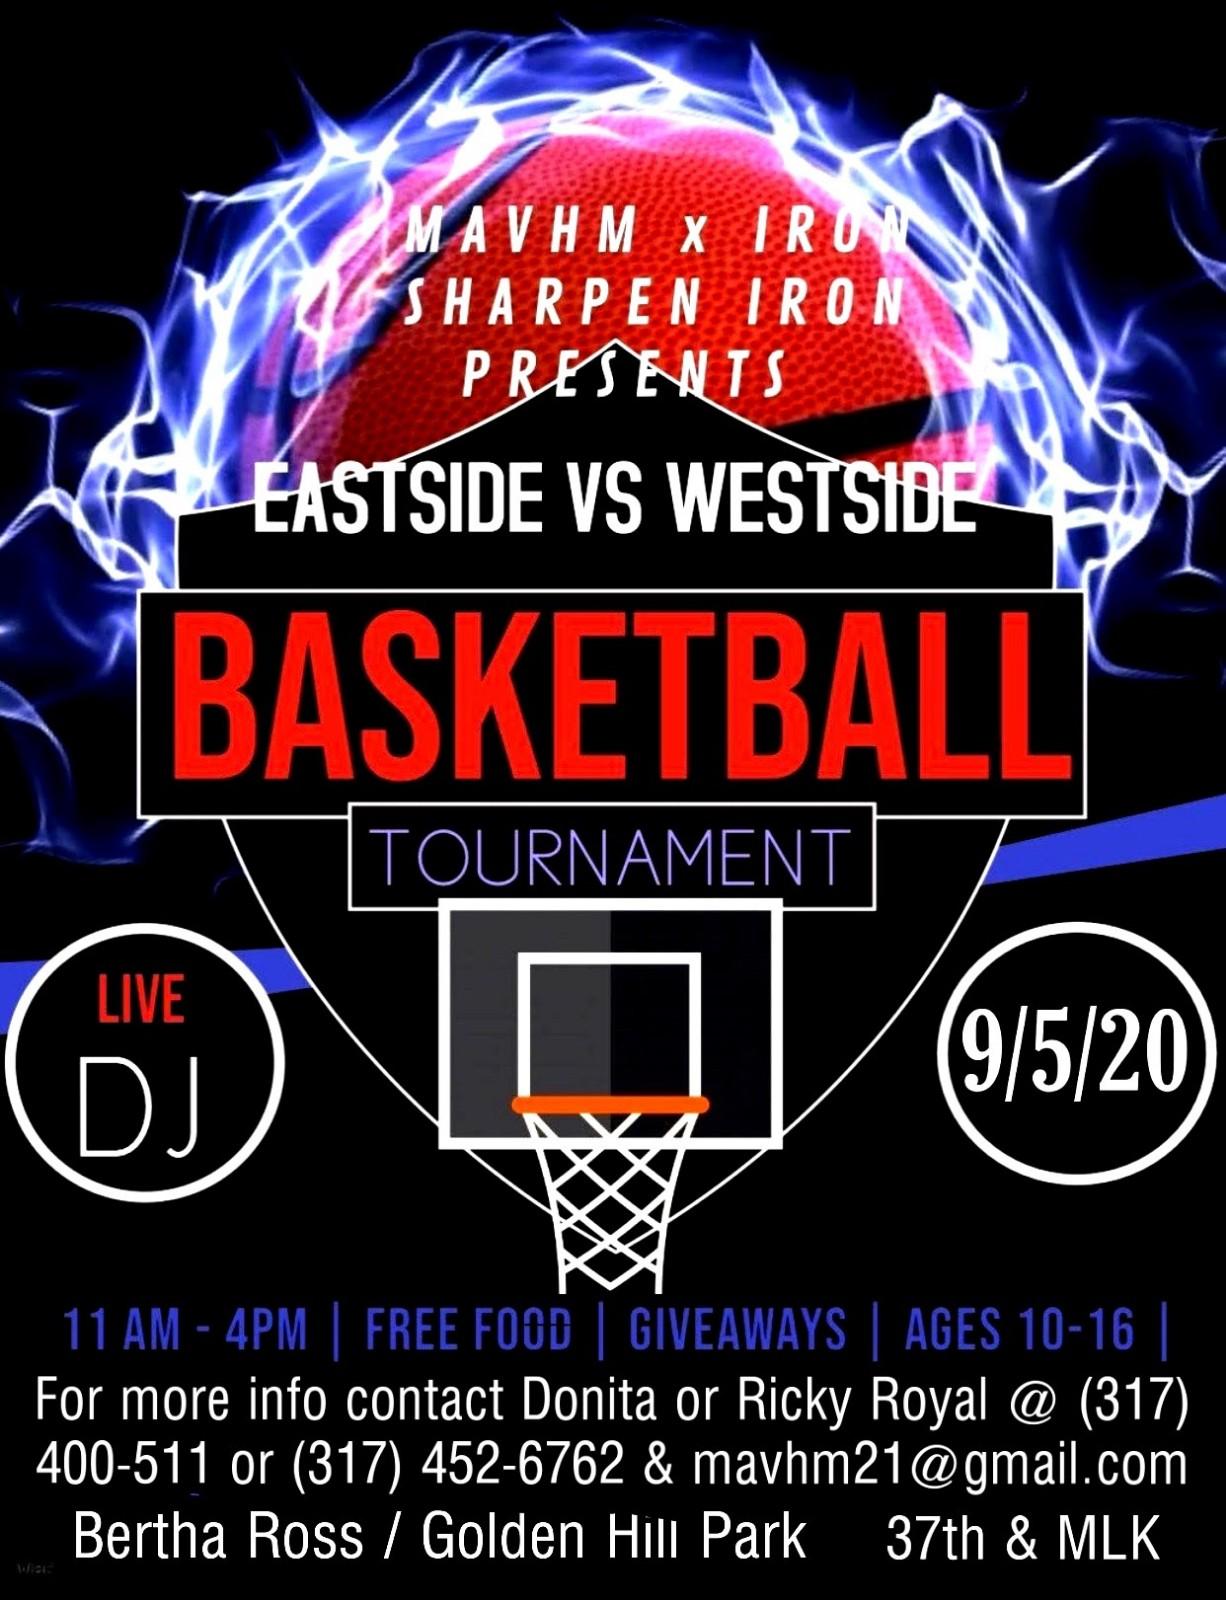 Basketball Tournement 1